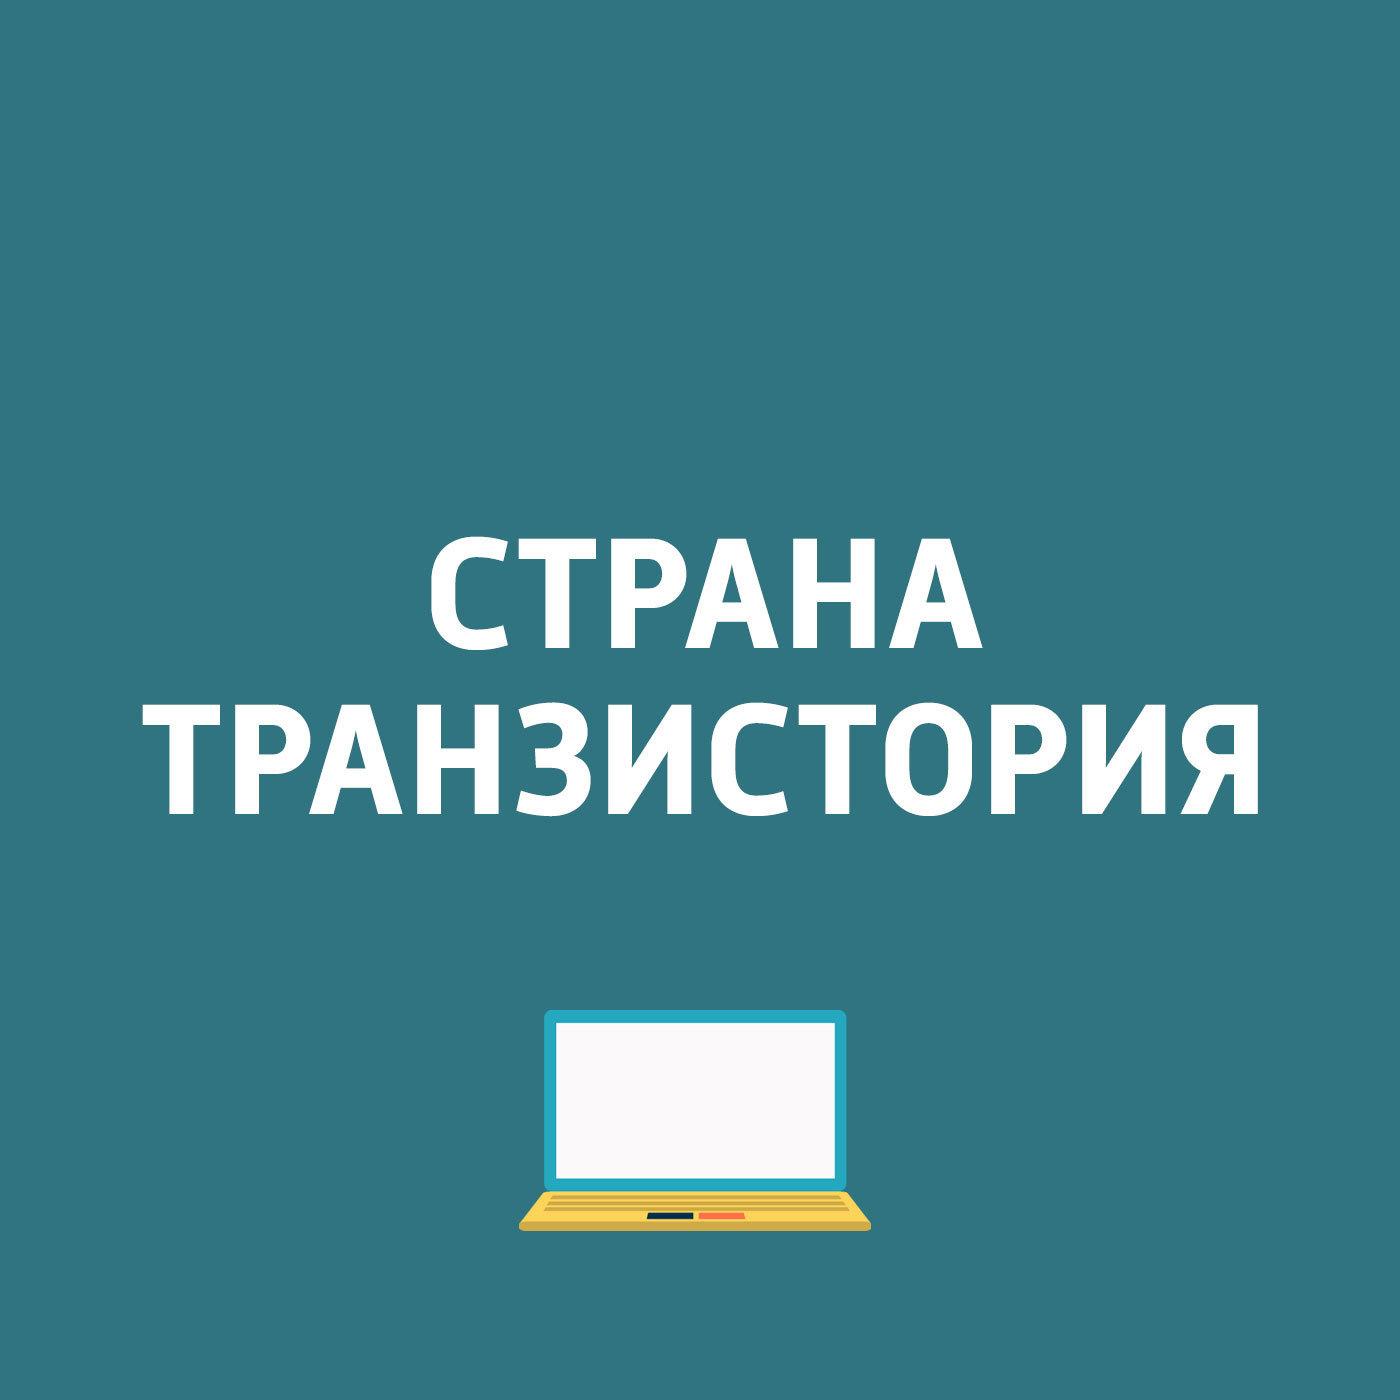 Картаев Павел Презентации 3, 5, 6 и 3310